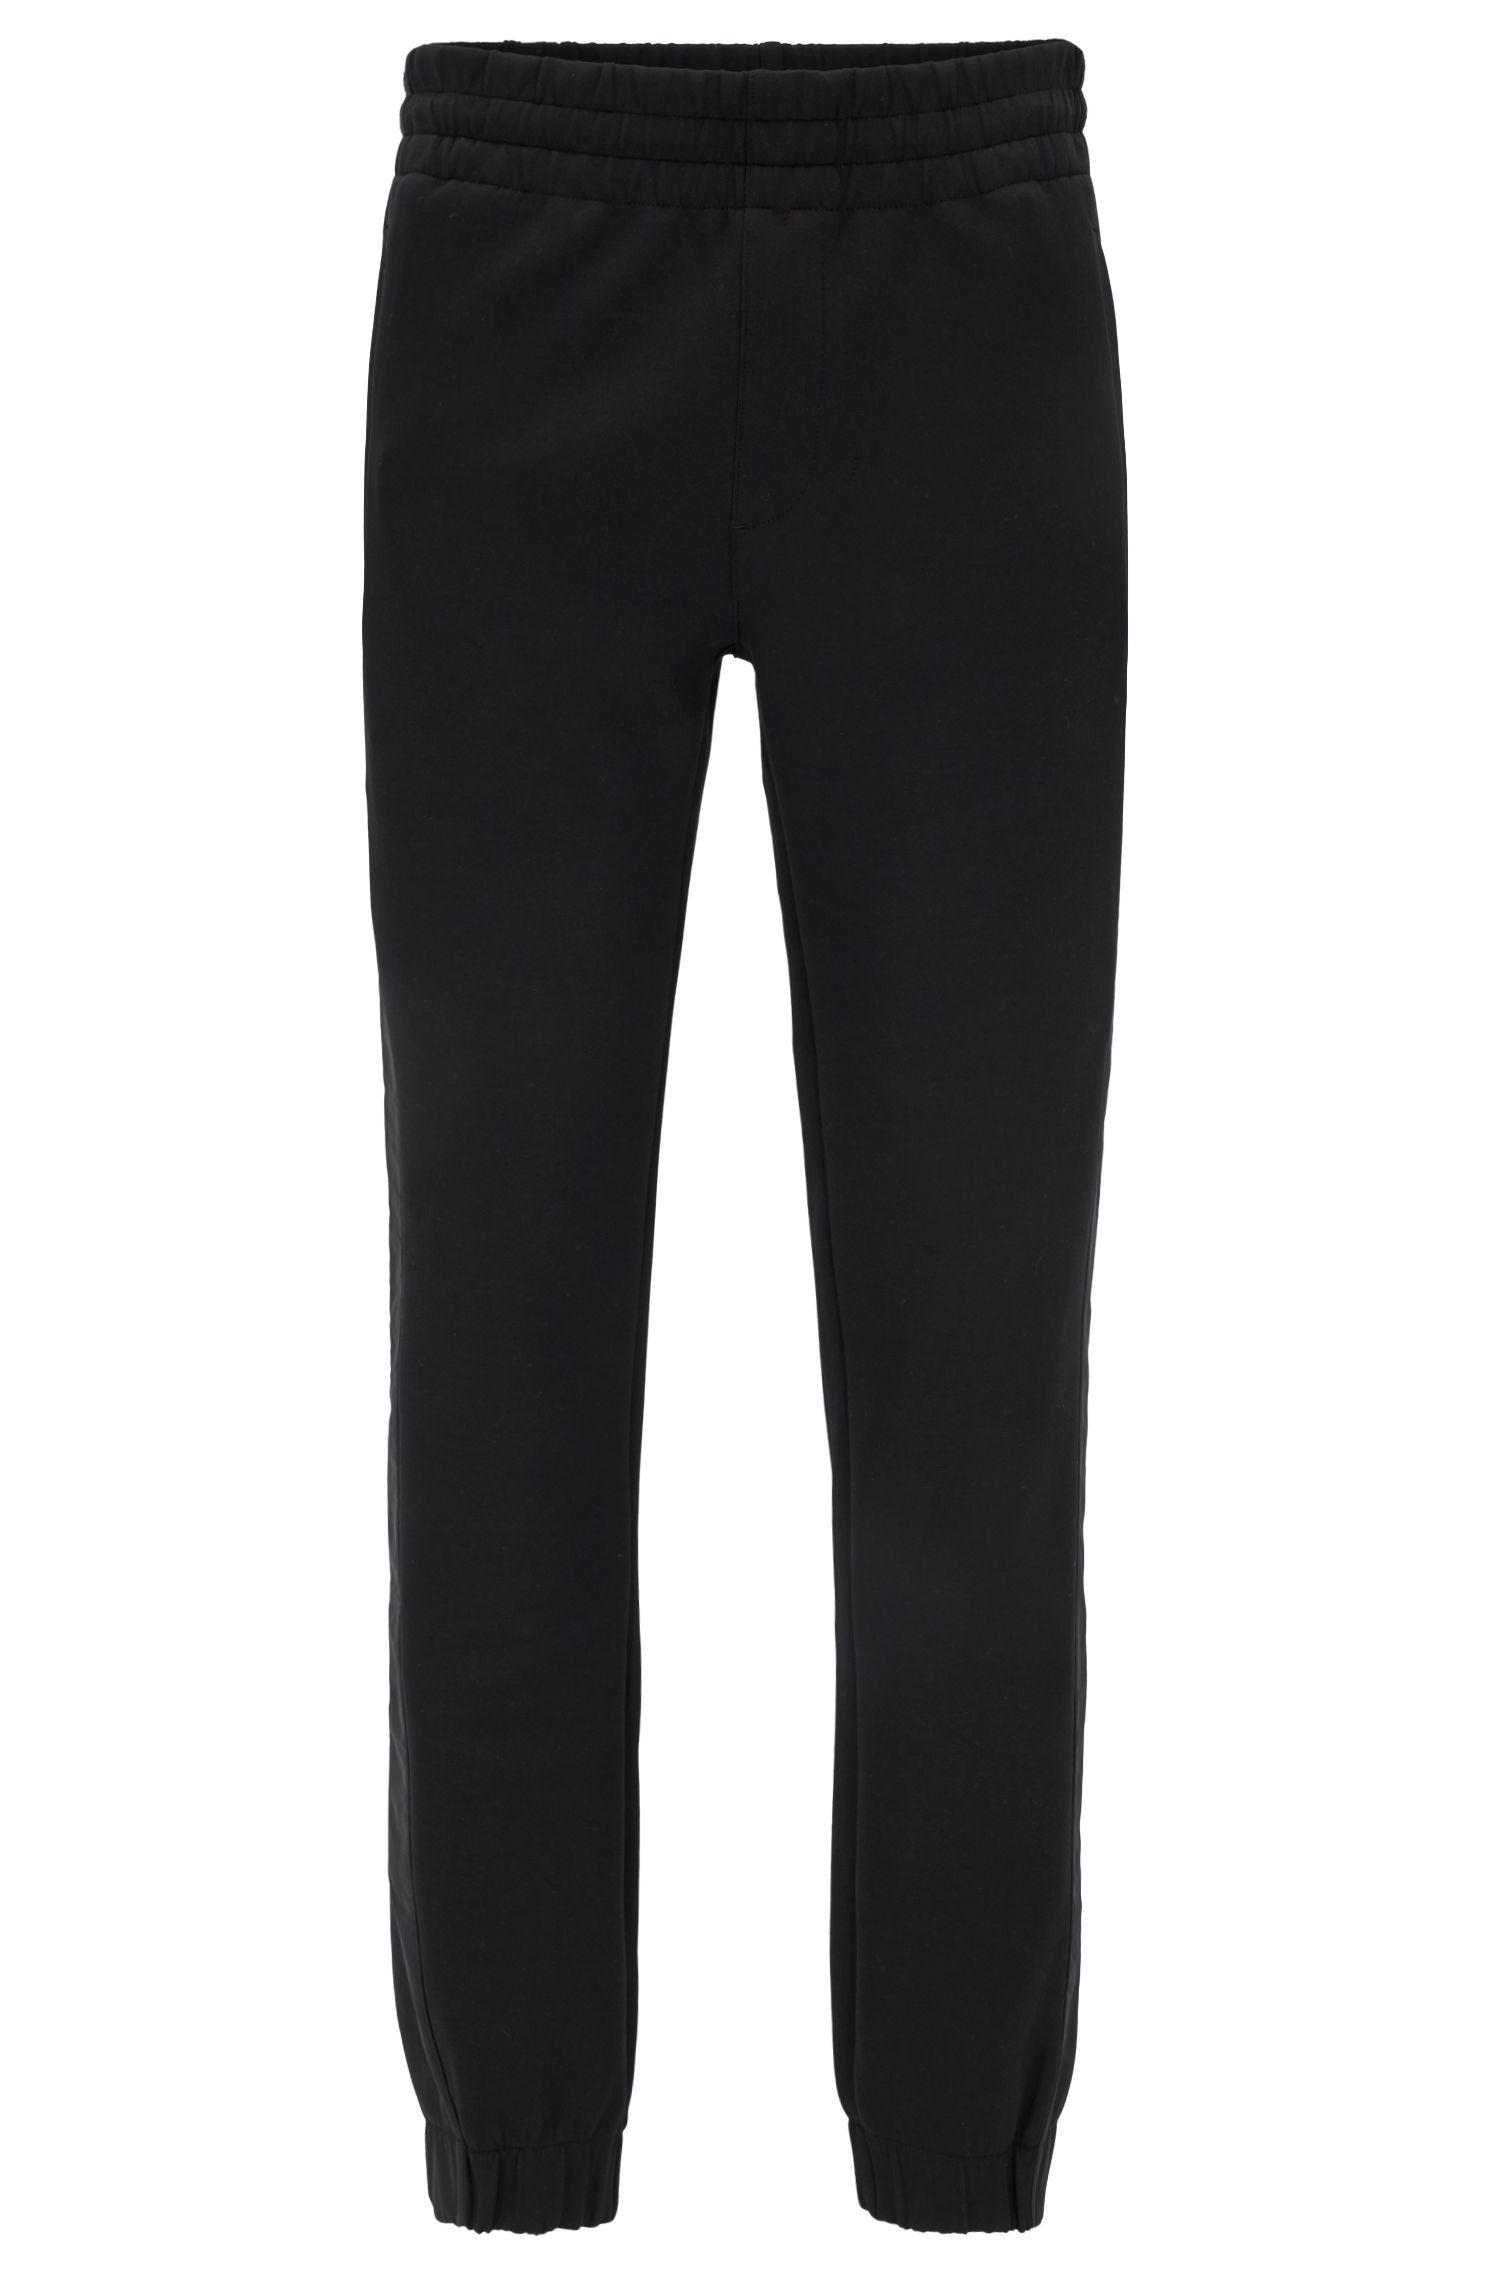 Slim-Fit Jersey-Hose aus der Mercedes-Benz Kollektion